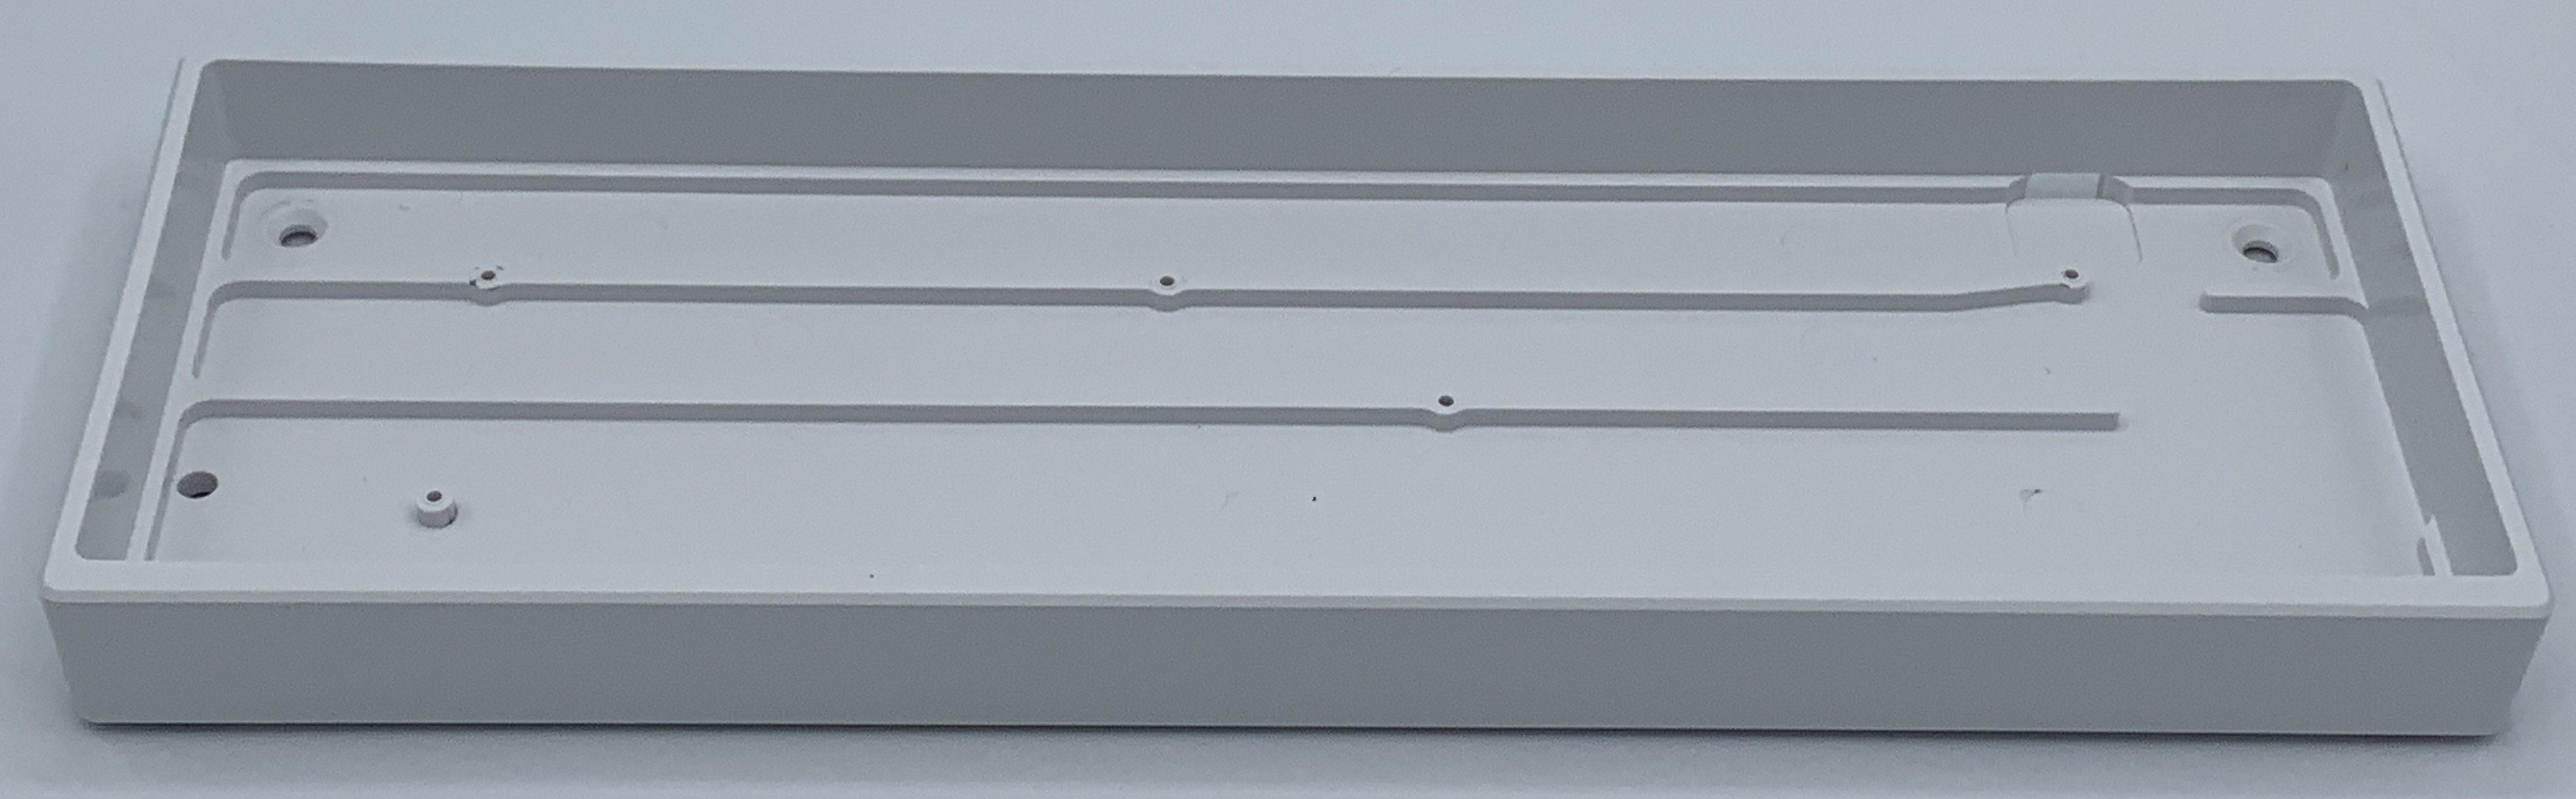 Inside of the TheKey.Company white plastic case